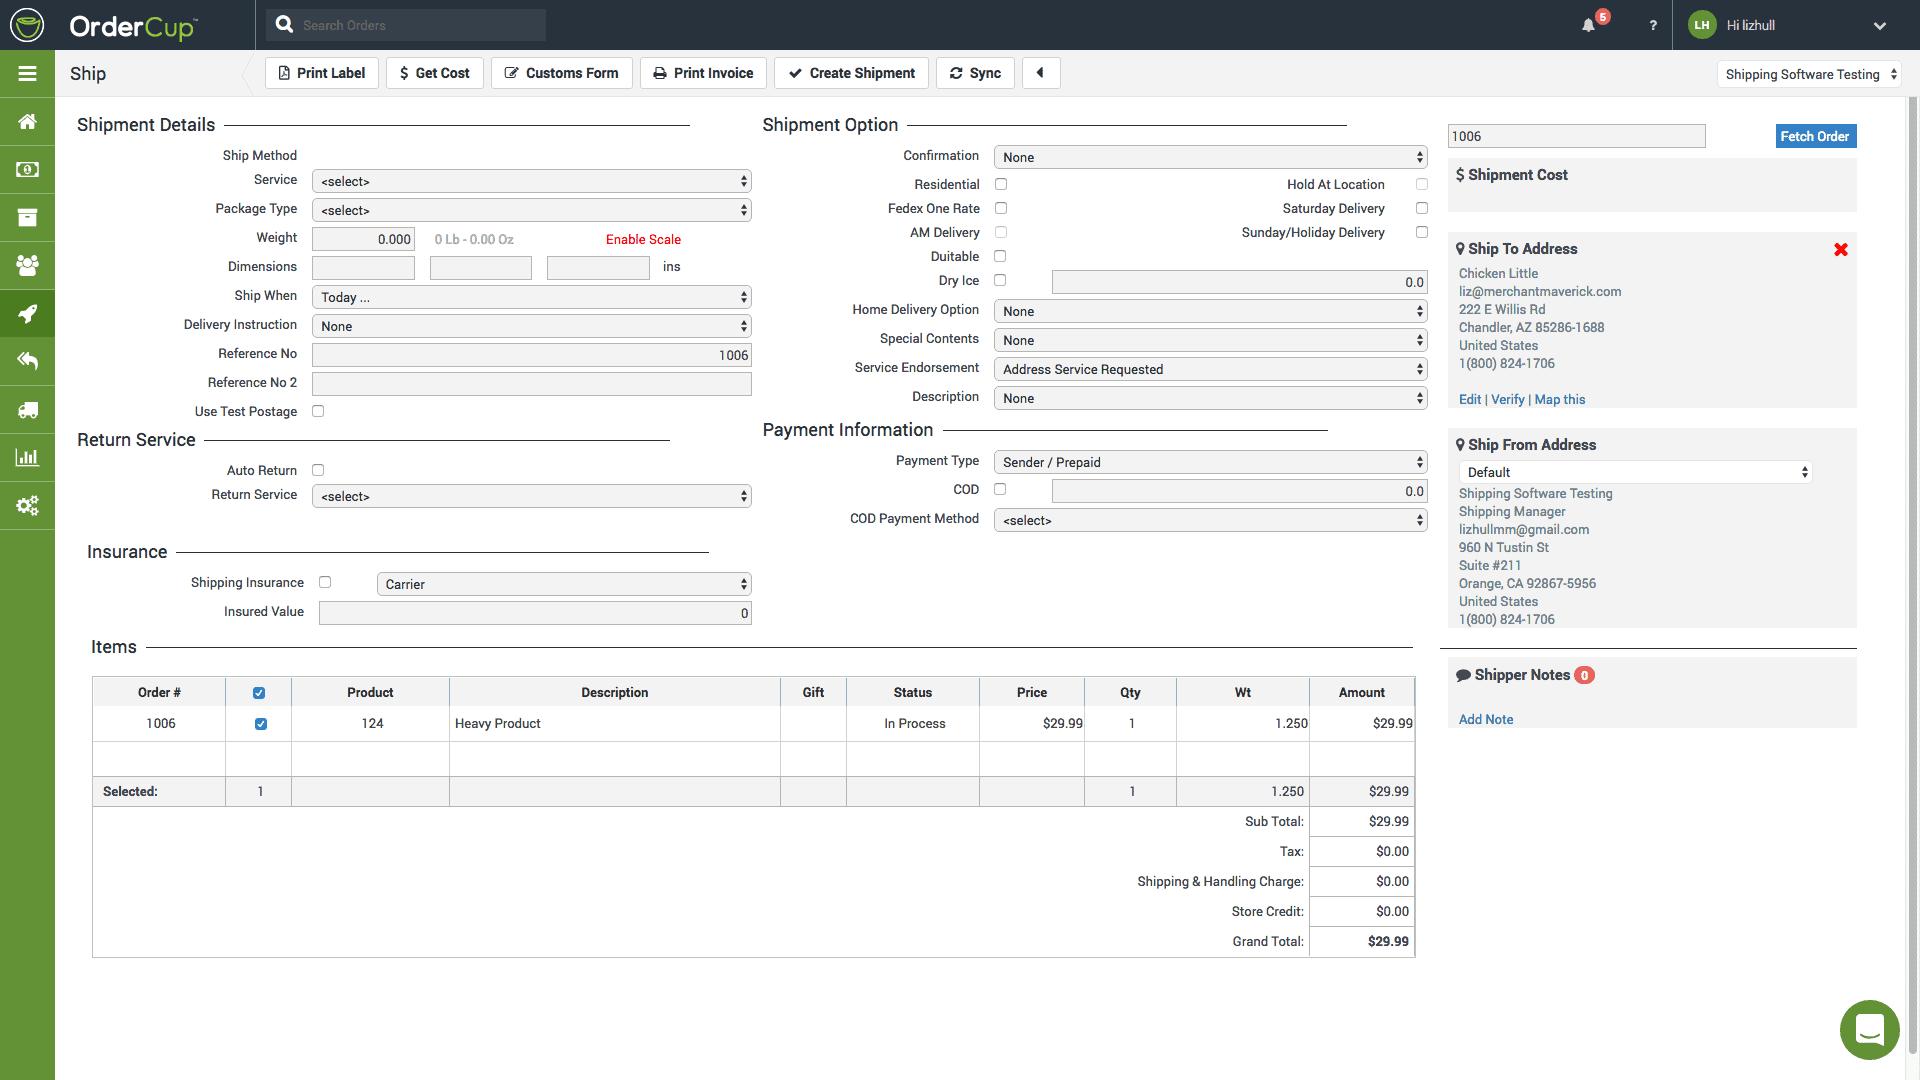 Screengrab of OrderCup order processing page